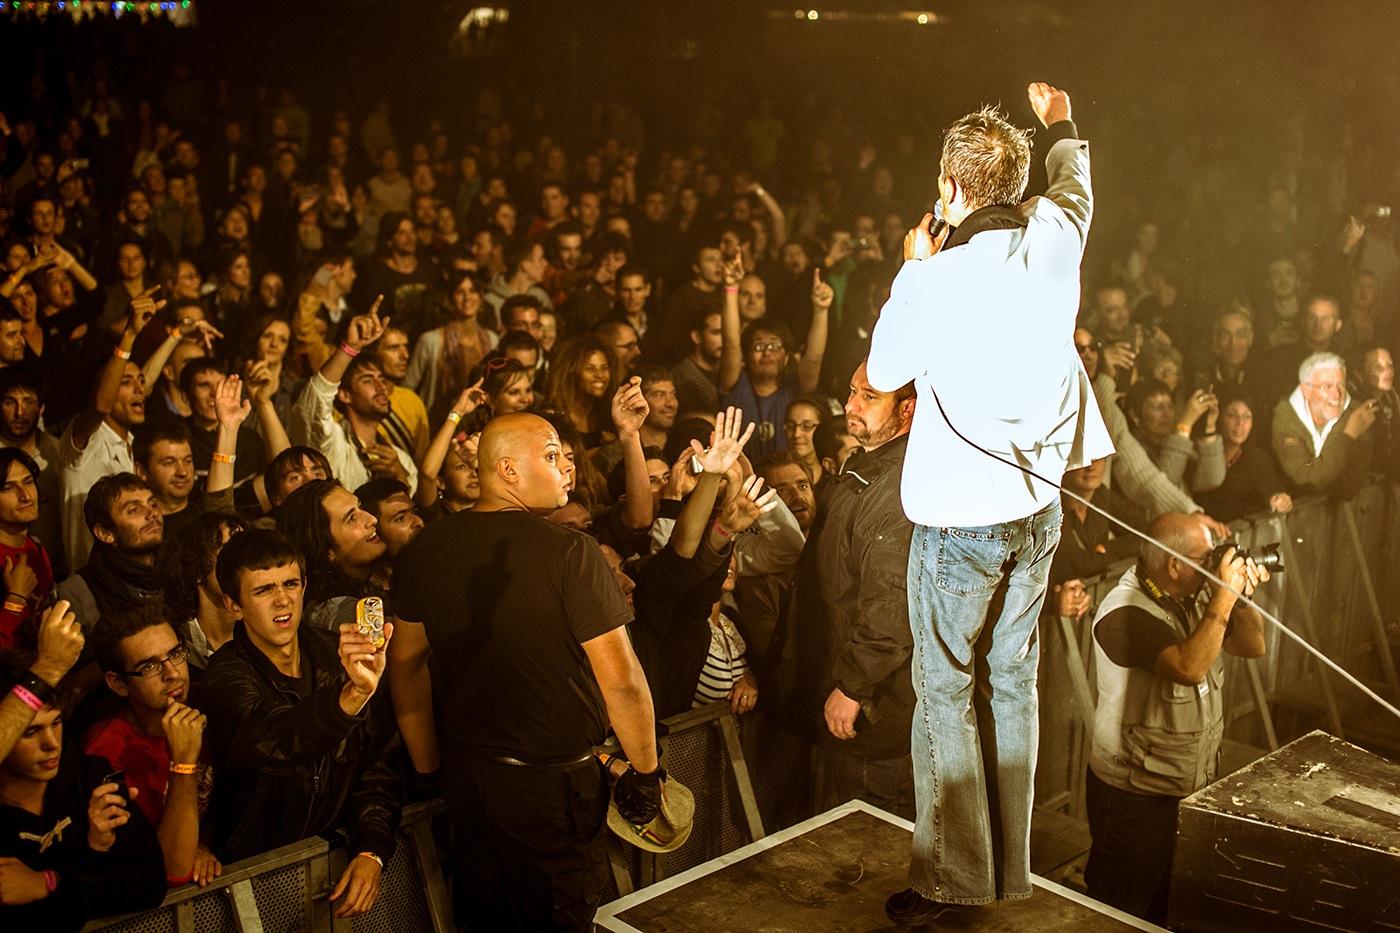 photographe-reportage-festival-rockadel-guillaume-heraud-032-small